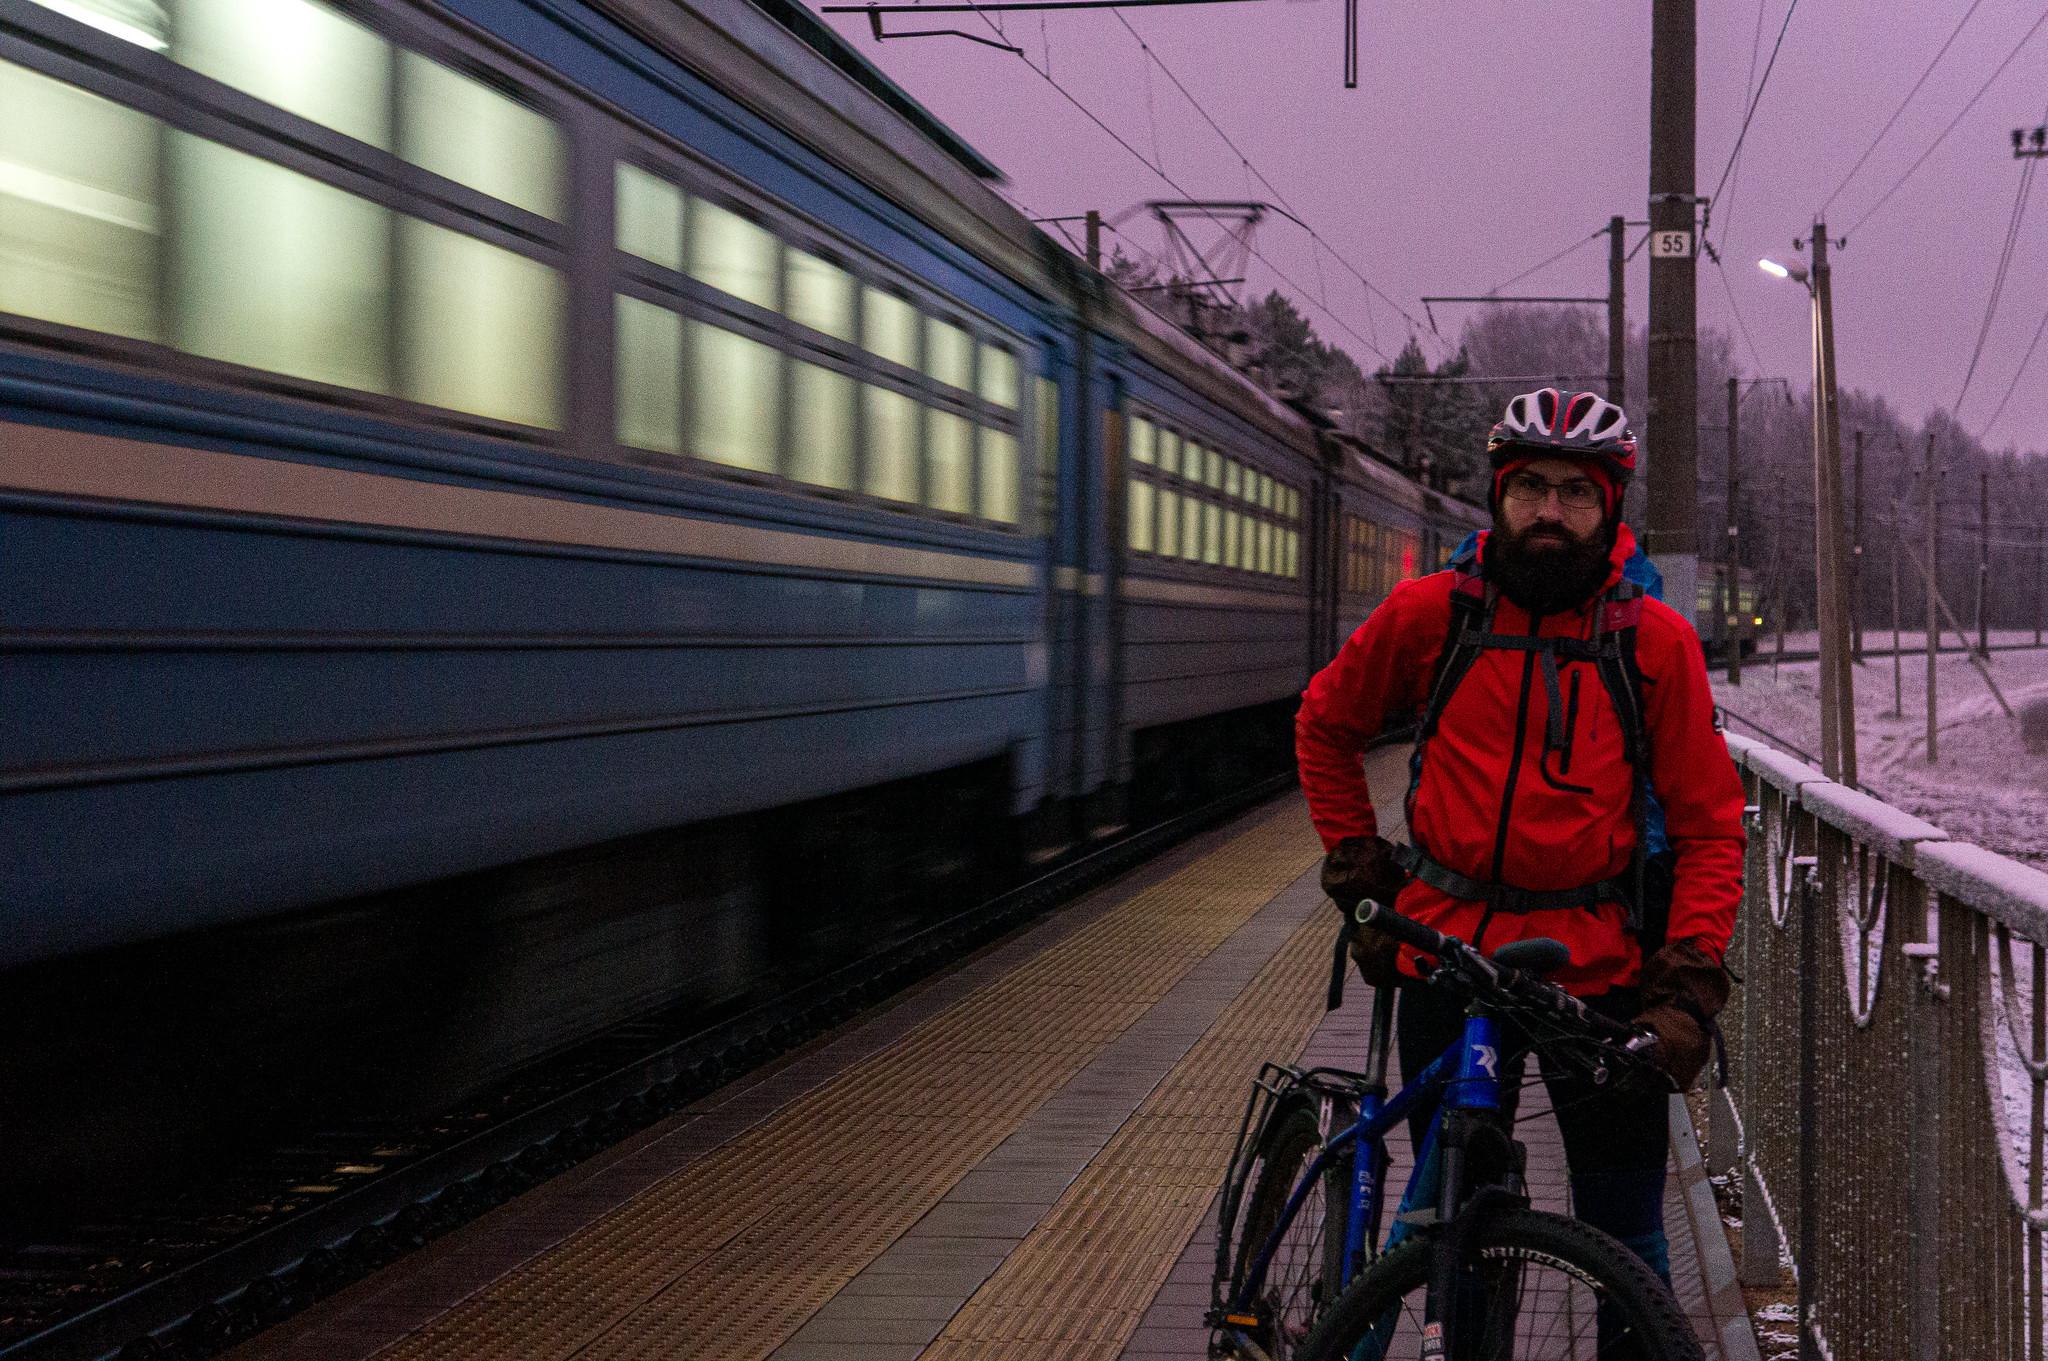 на станции Крыжовка